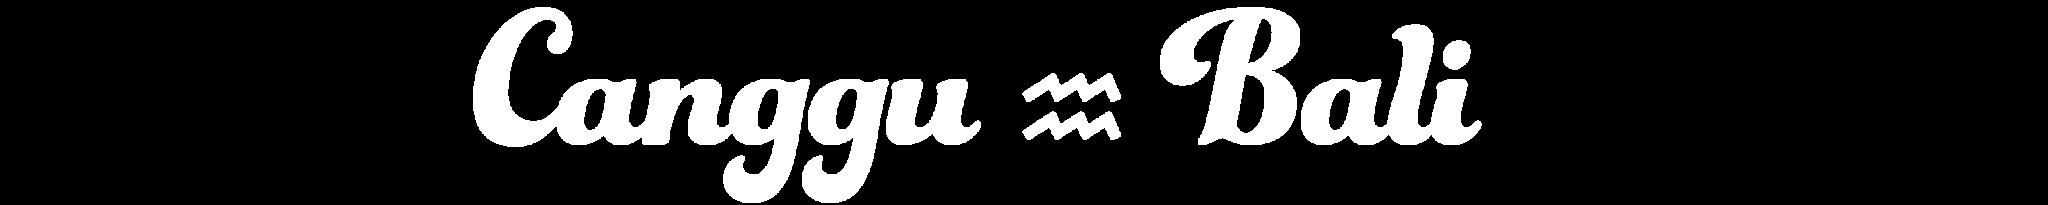 canggu-bali-name